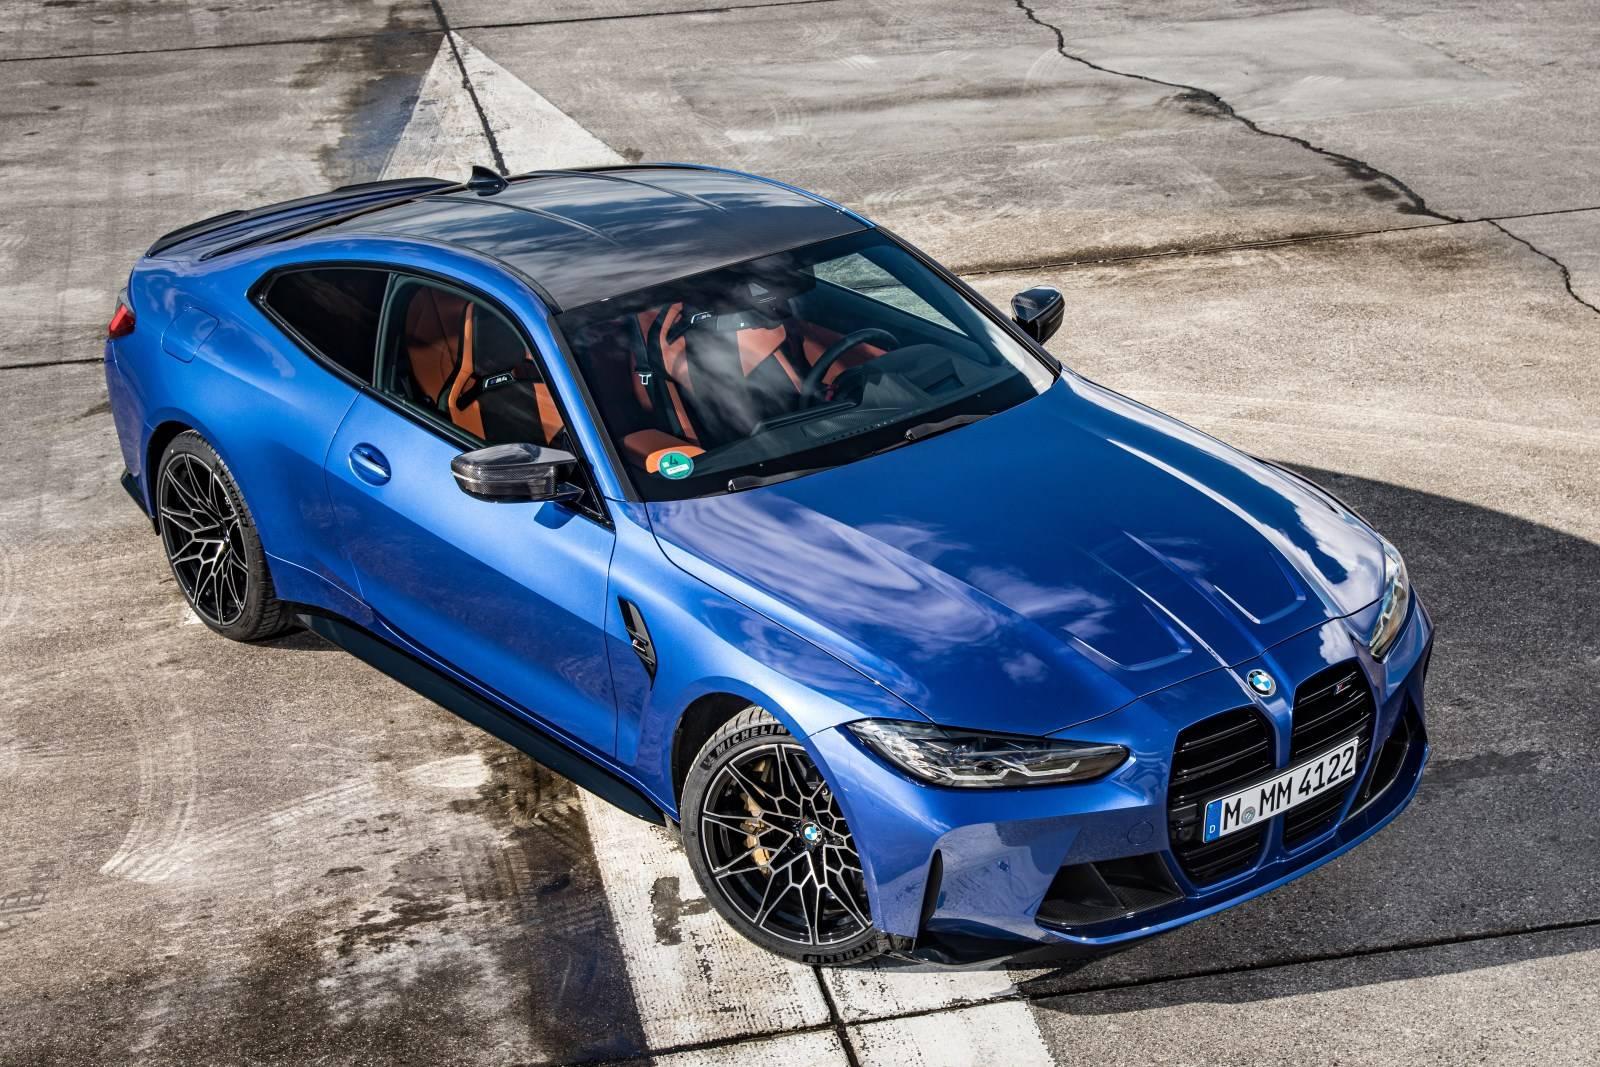 Седан BMW M3 и купе BMW M4 Competition прошли тест-драйв 3